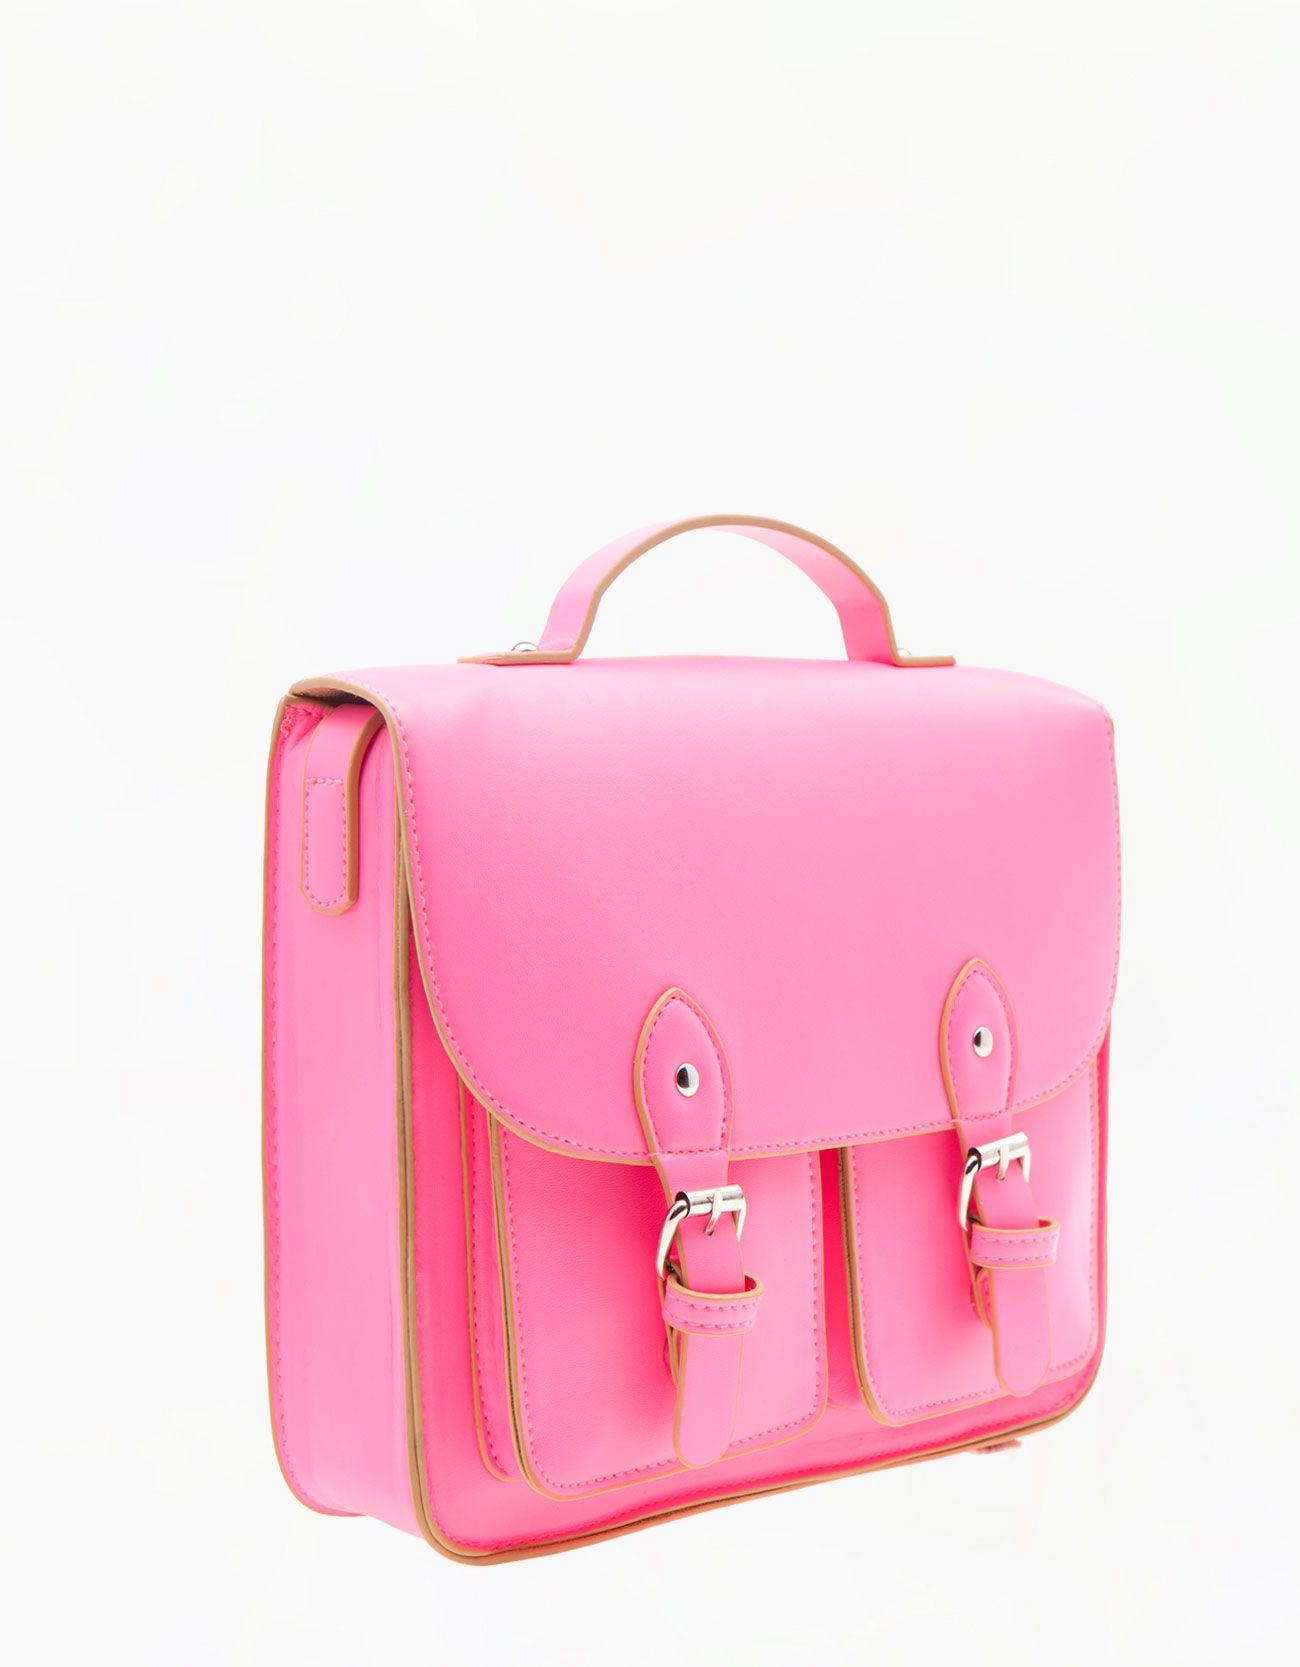 e8795988bb77 Bershka Indonesia - Multicoloured pocket bag   shop   Pinterest ...